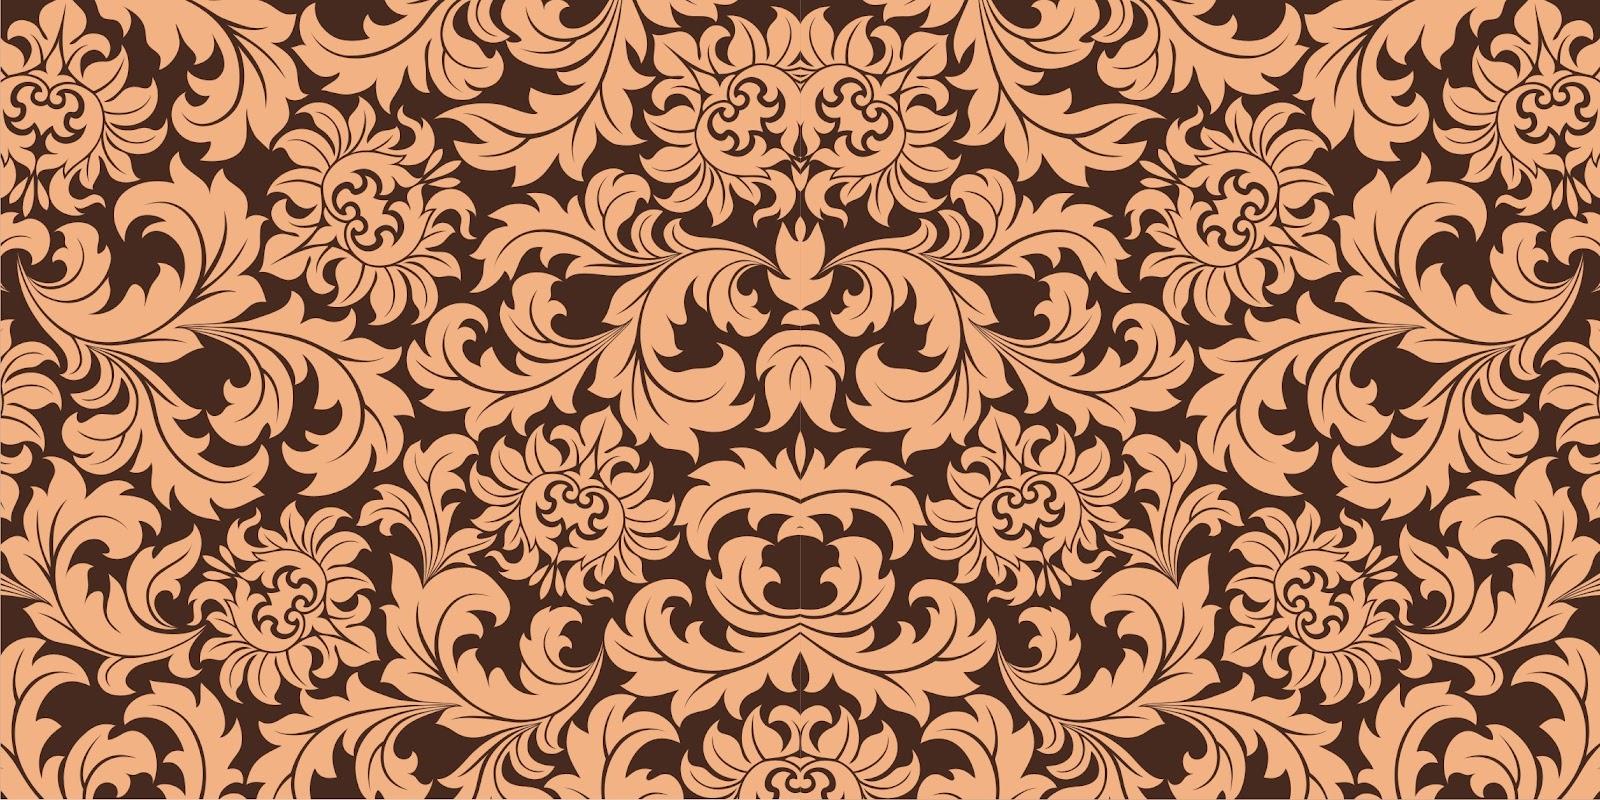 Indonesian Abstrak Batik: Free DOWNLOAD Vector